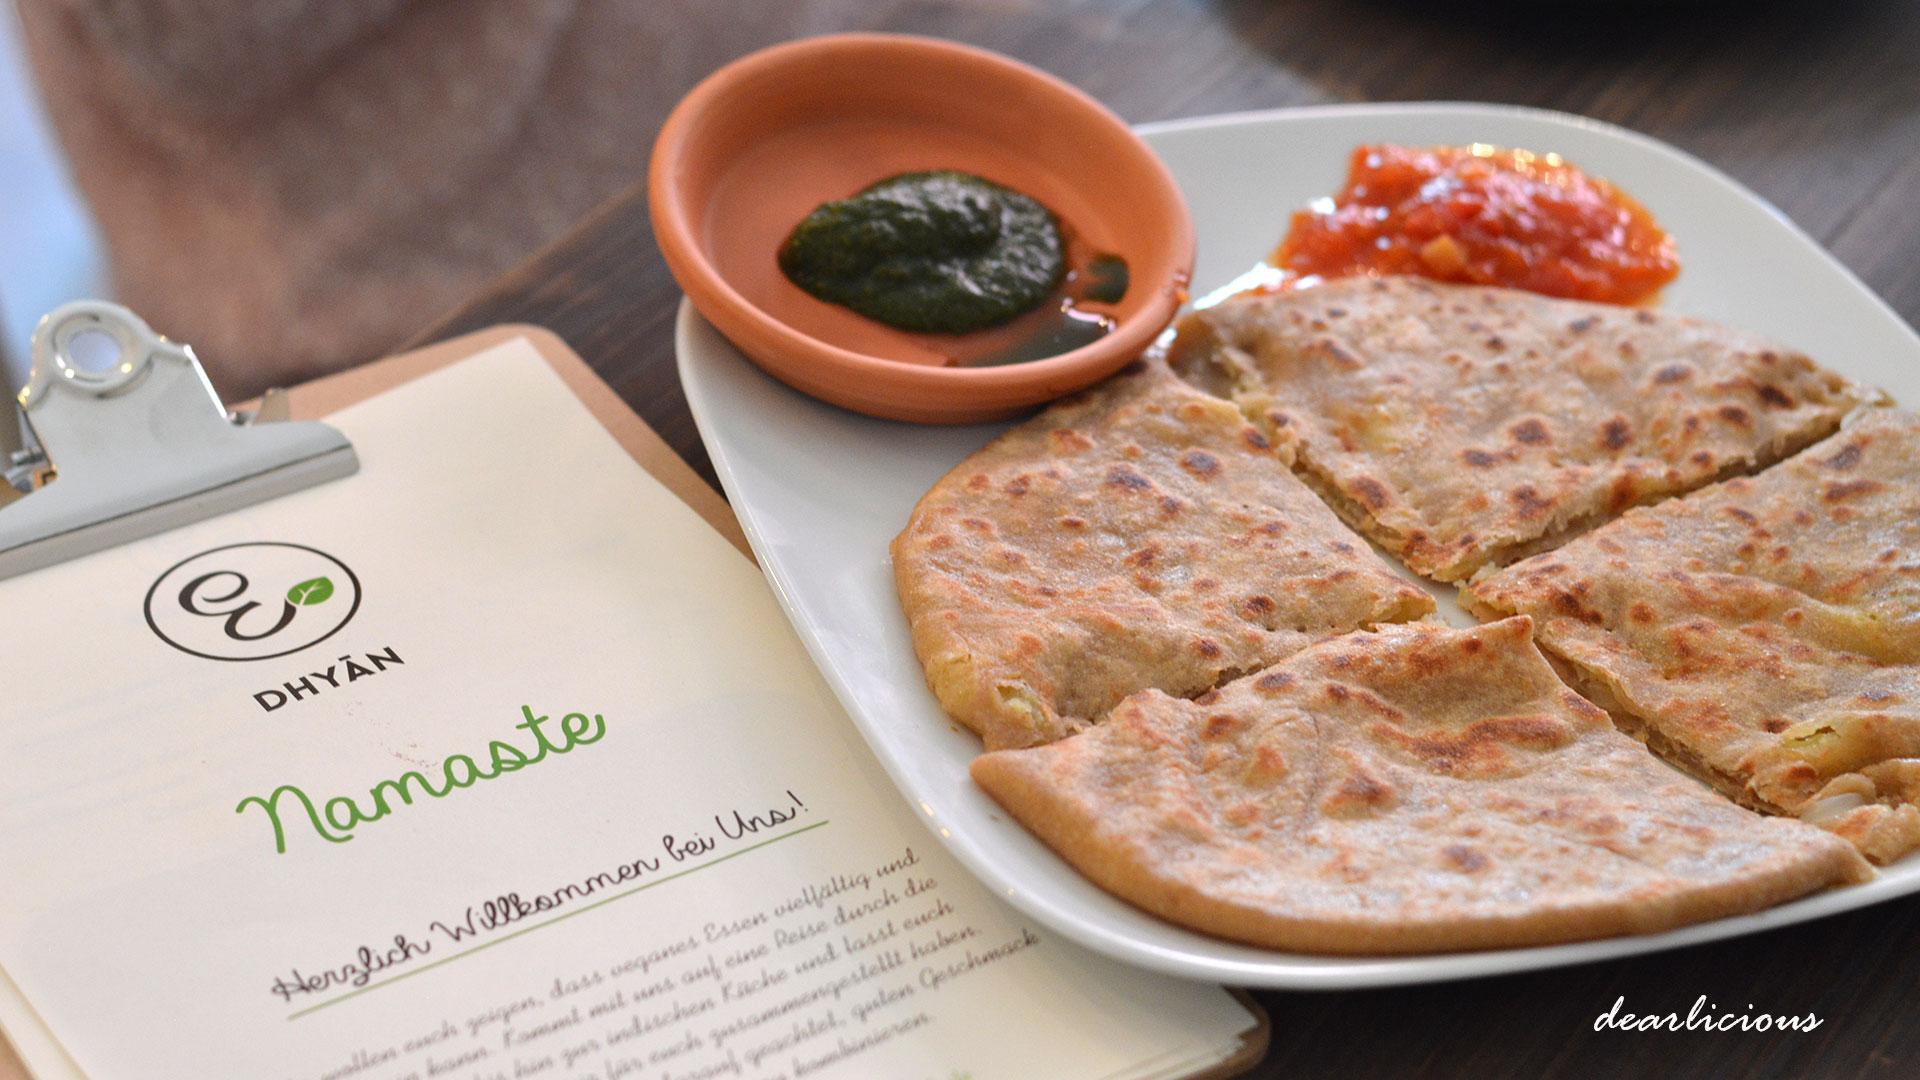 Dhyān: Indisch-vegetarisches Restaurant in Mainz | dearlicious | http://dearlicious.blogspot.com/2016/04/indisches-restaurant-dhyan-mainz.html